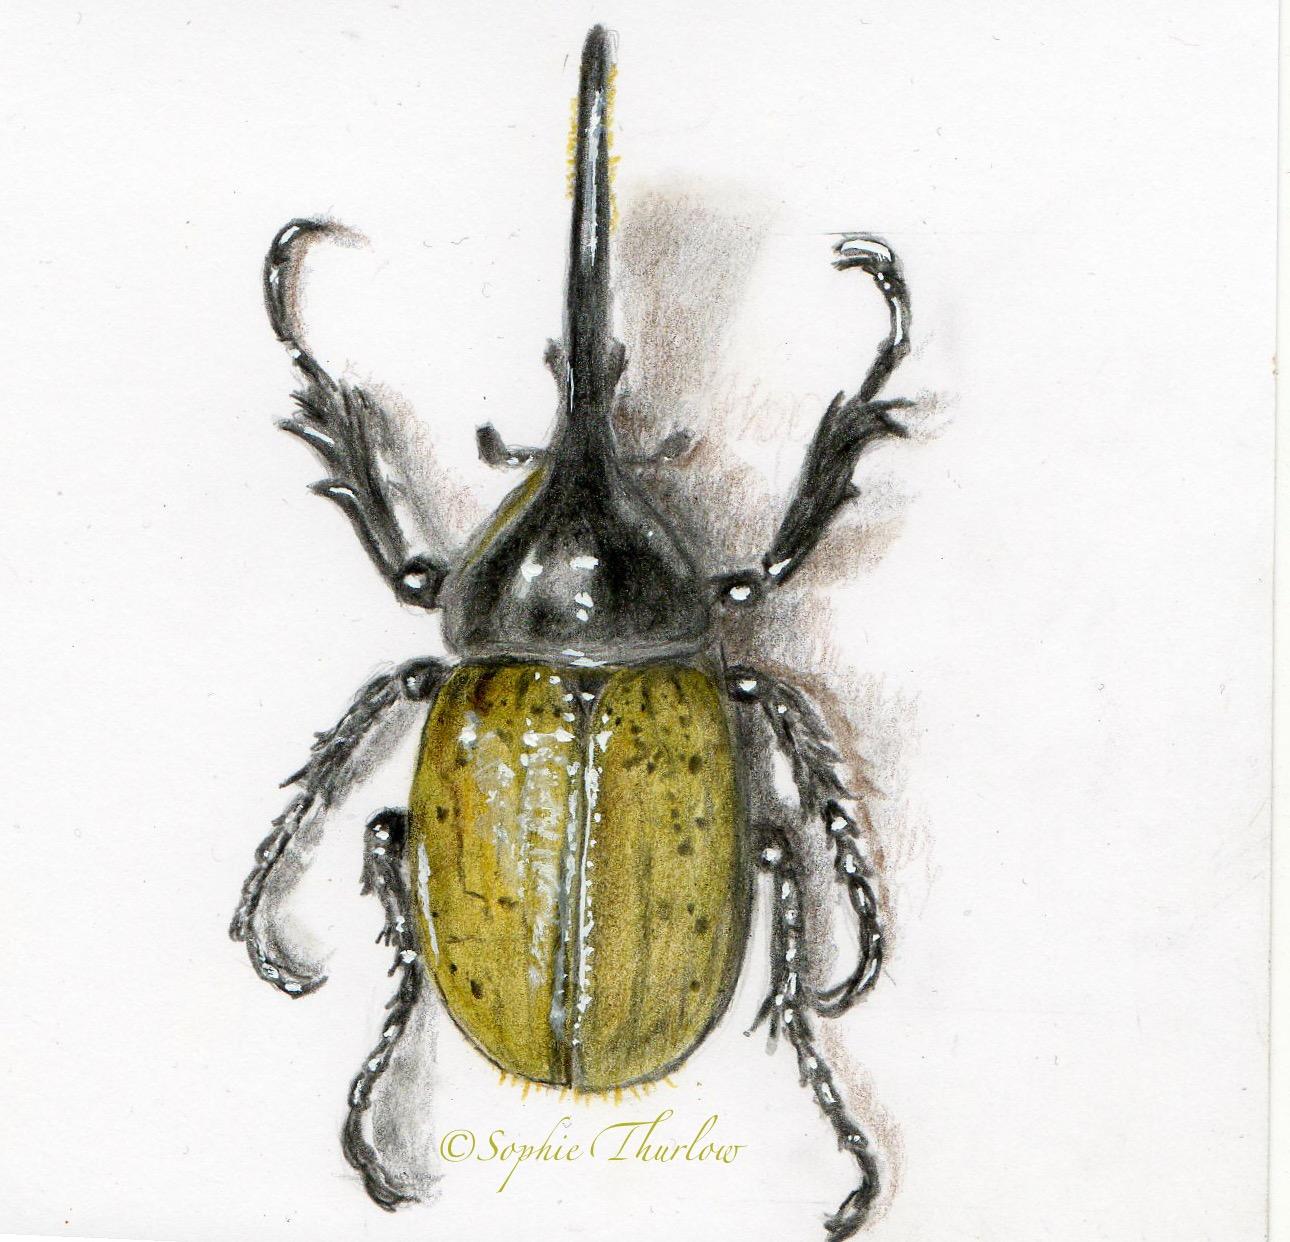 Drawn beatle hercules beetle #6